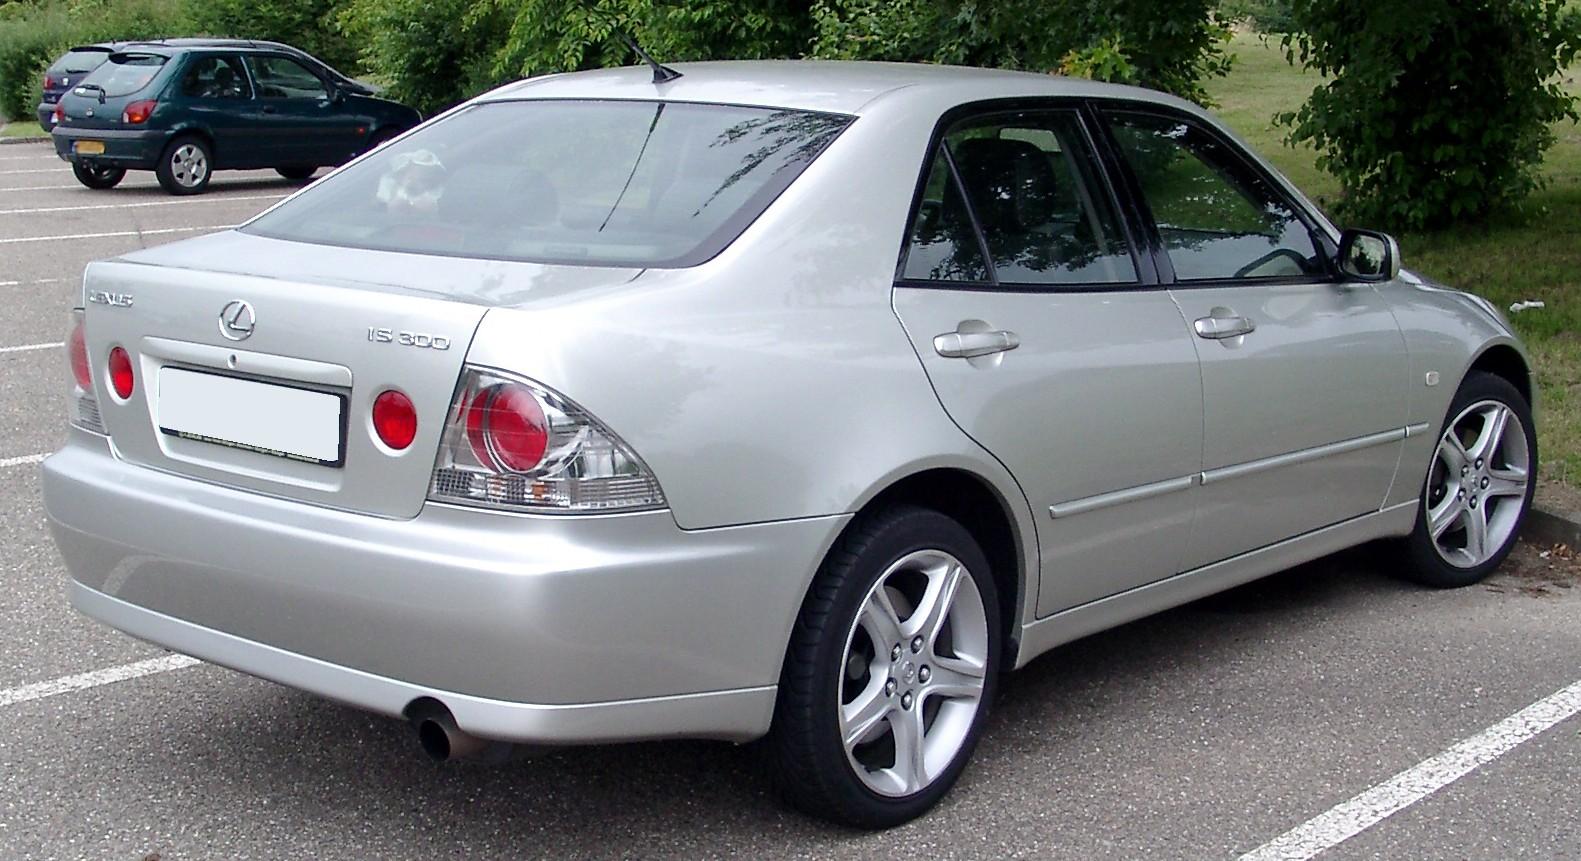 Lexus IS 300 rear High Resolution Wallpaper Free